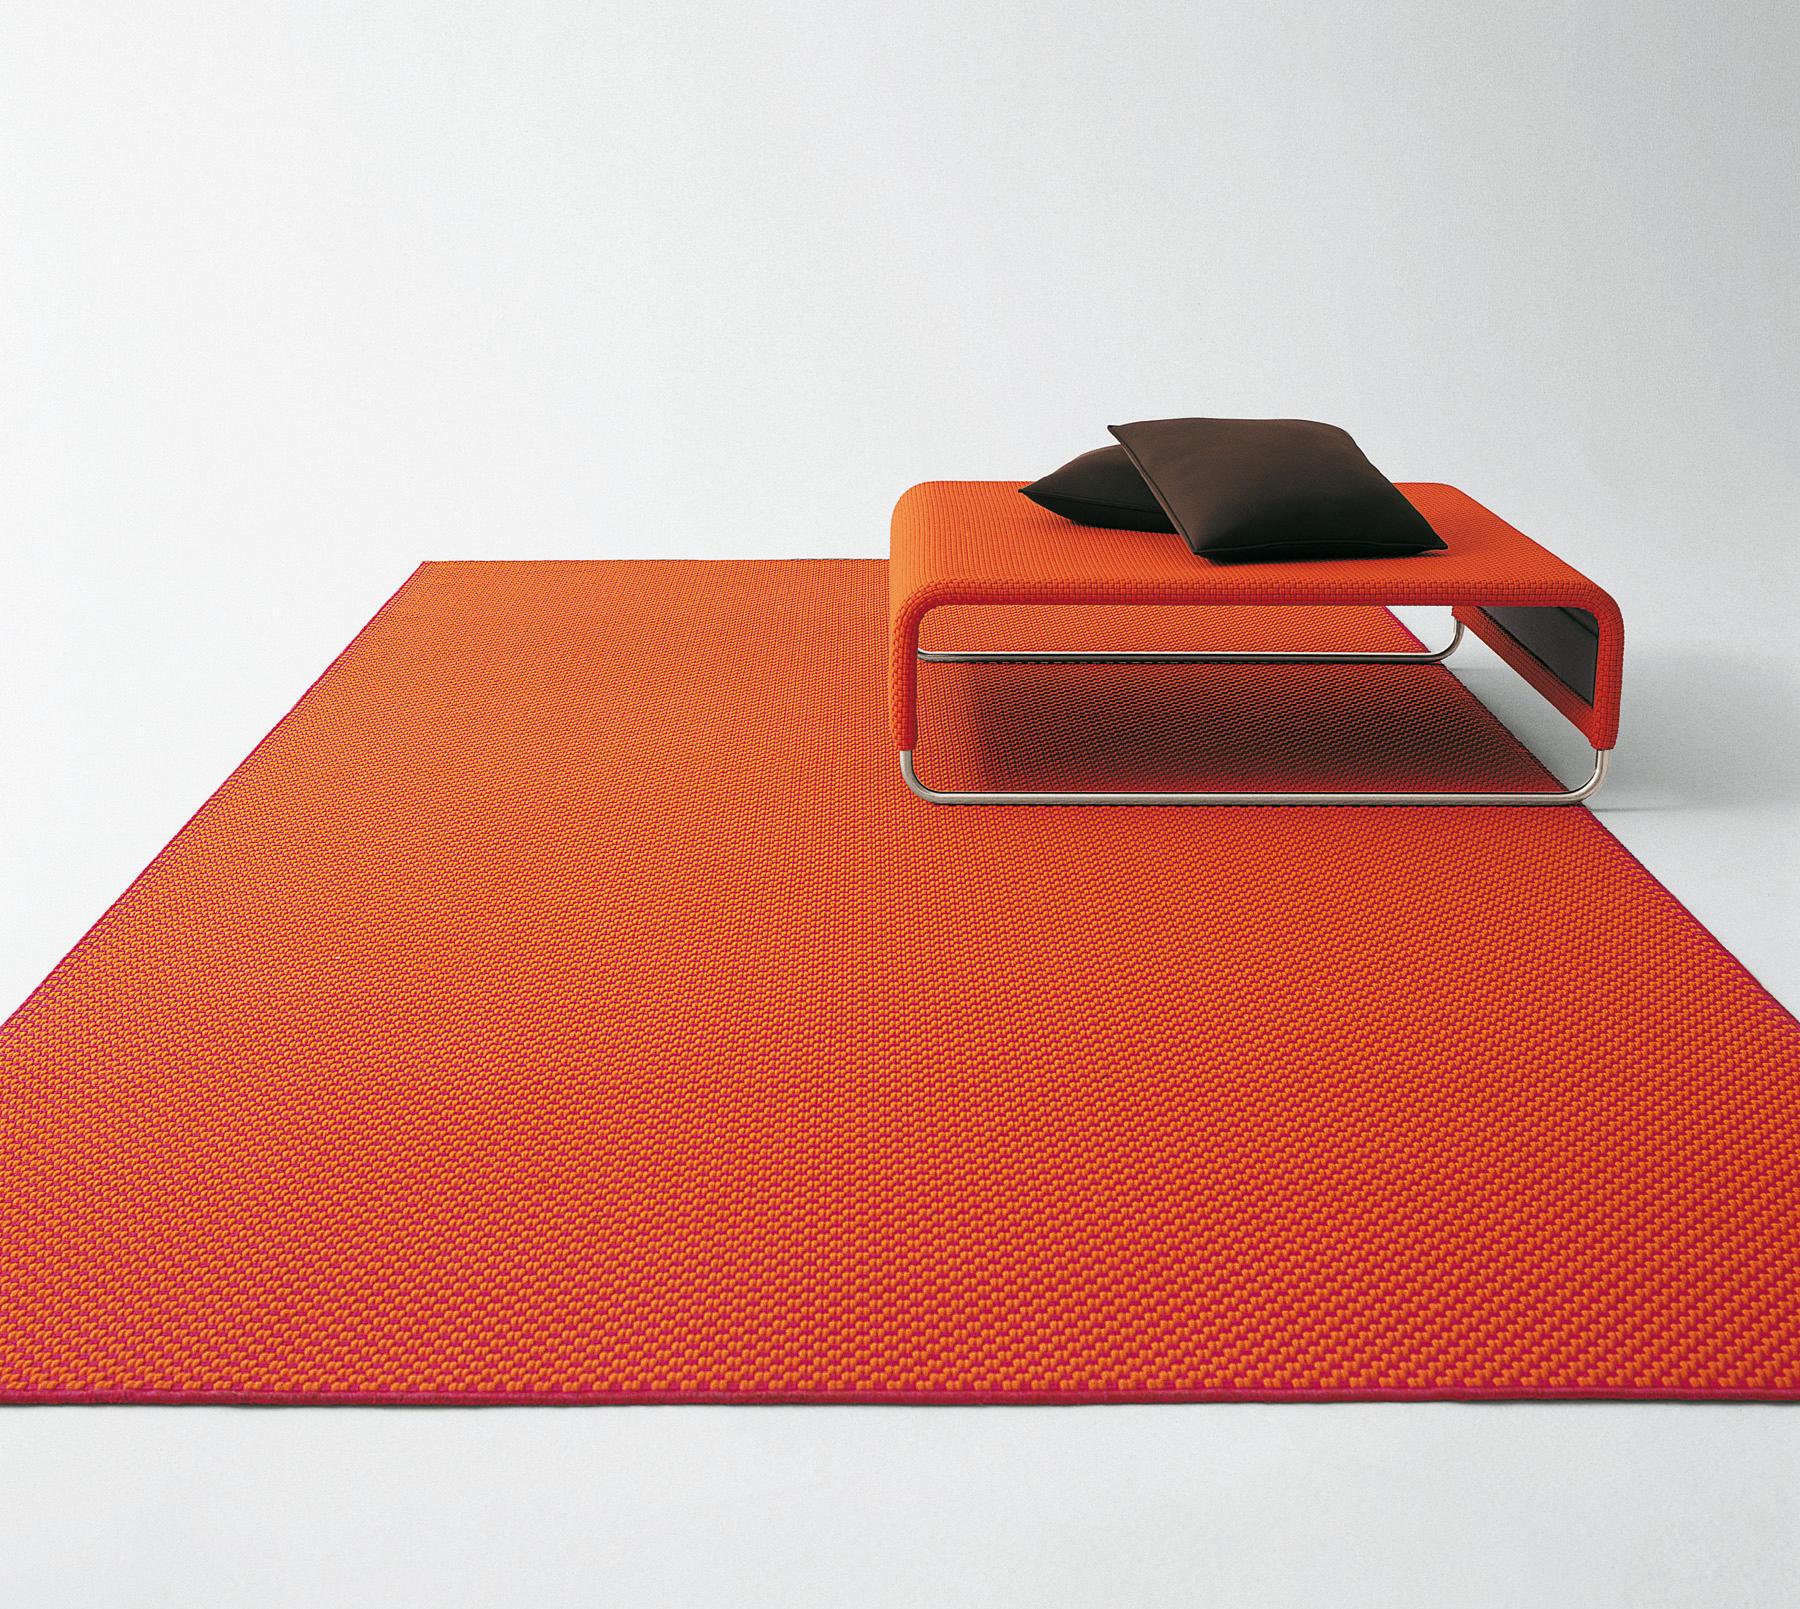 mat formatteppiche designerteppiche von paola lenti architonic. Black Bedroom Furniture Sets. Home Design Ideas